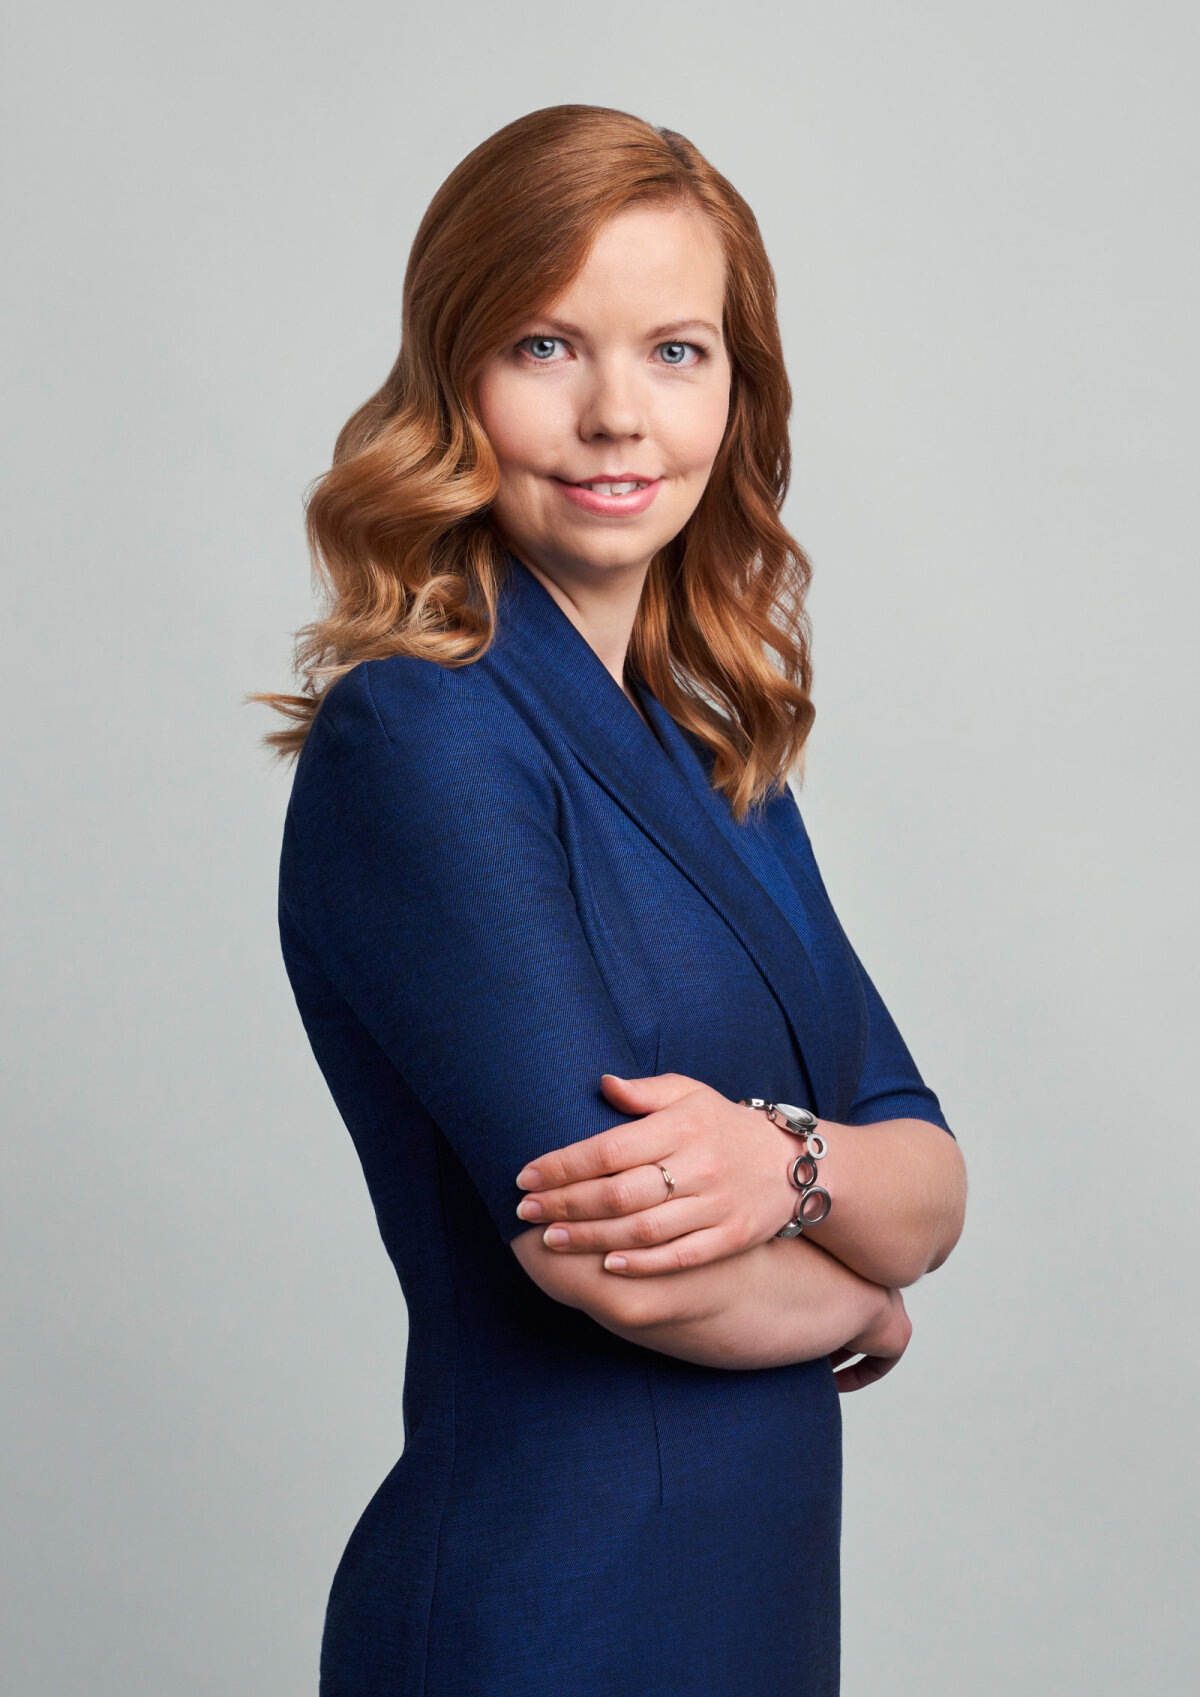 Kaija Põhako-Esko